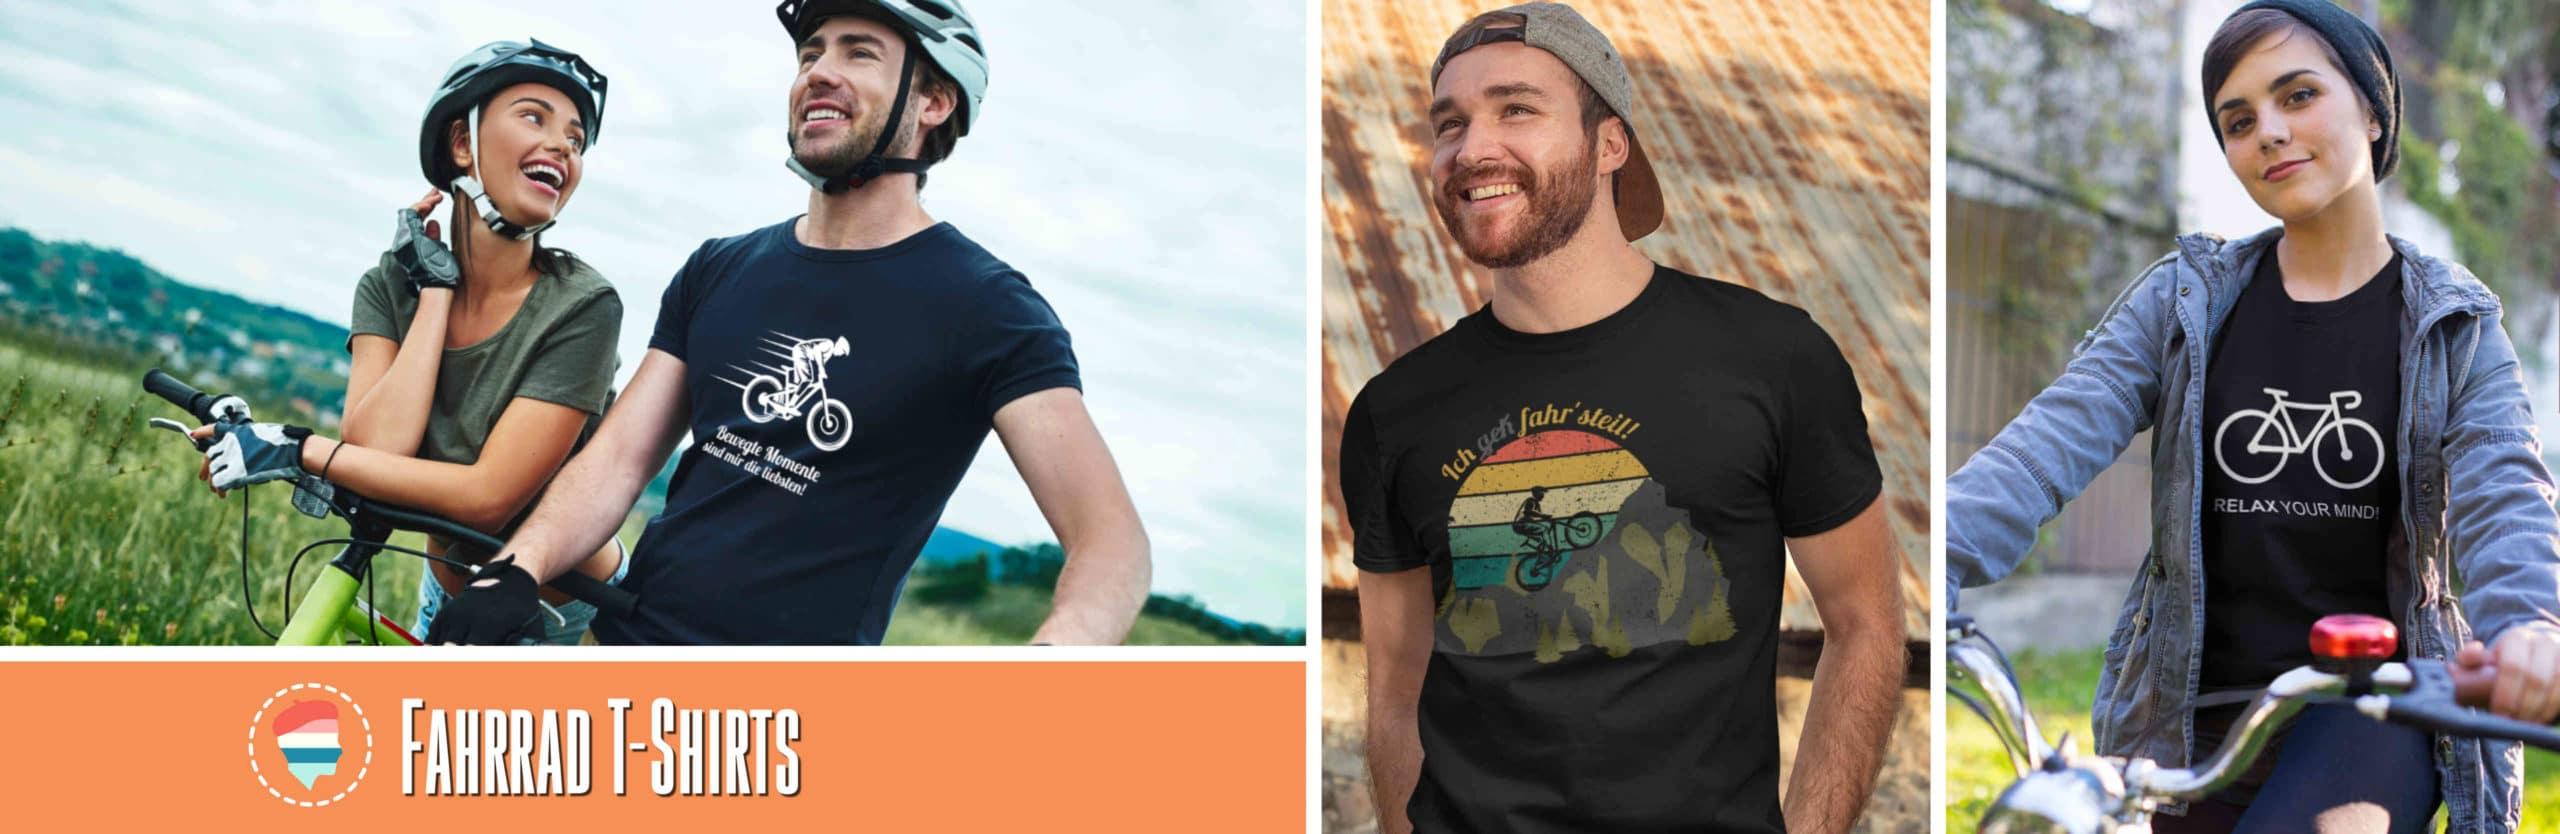 Retina5120px-Banner-Fahrrad-T-Shirts